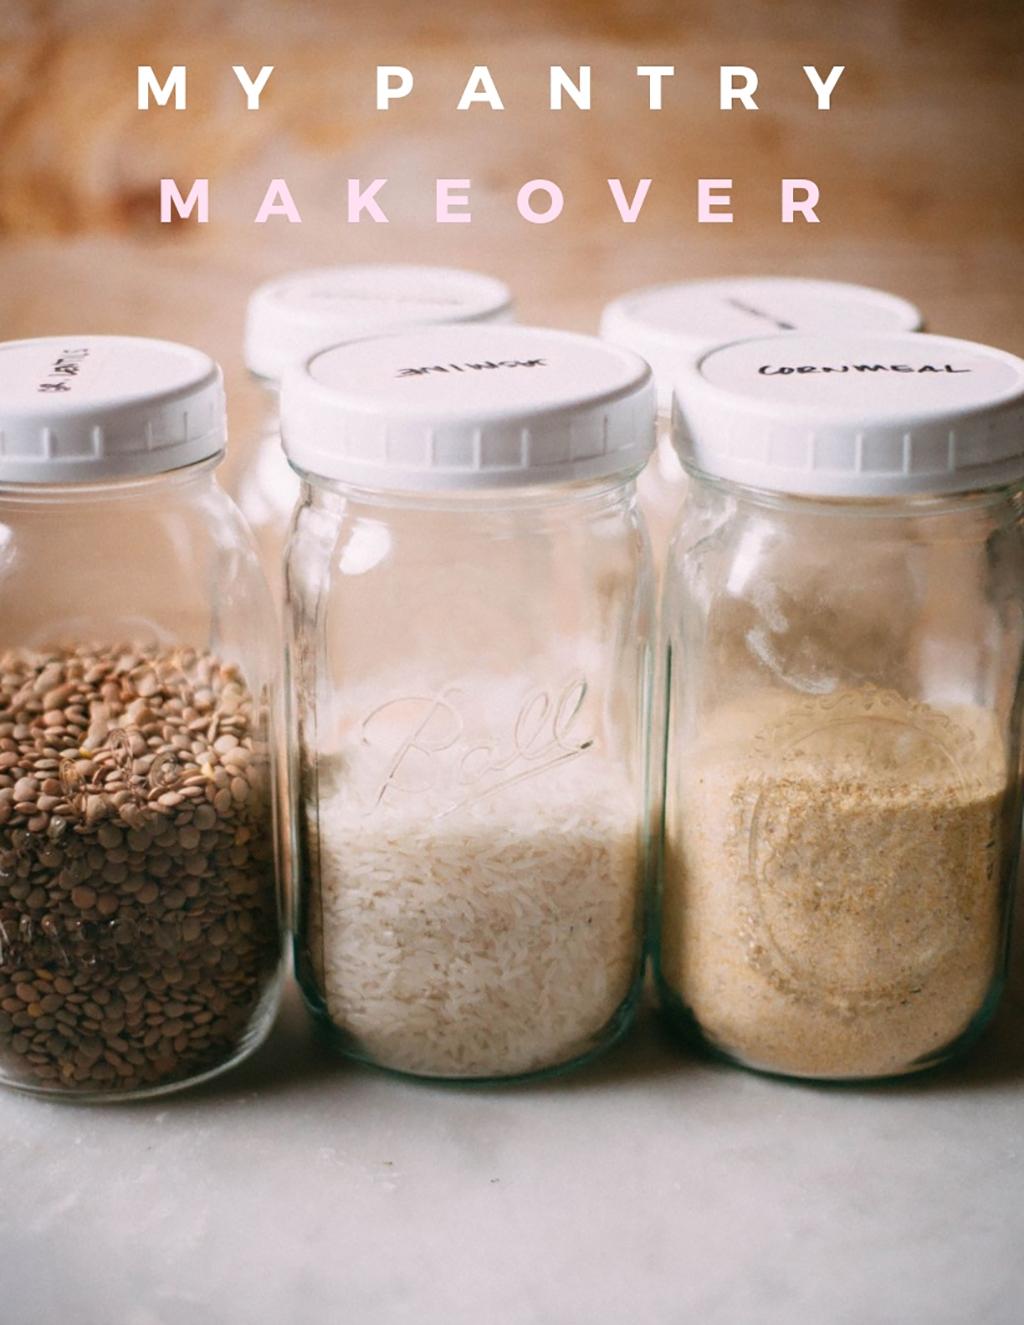 My Pantry Makeover - Tastemaker Blog